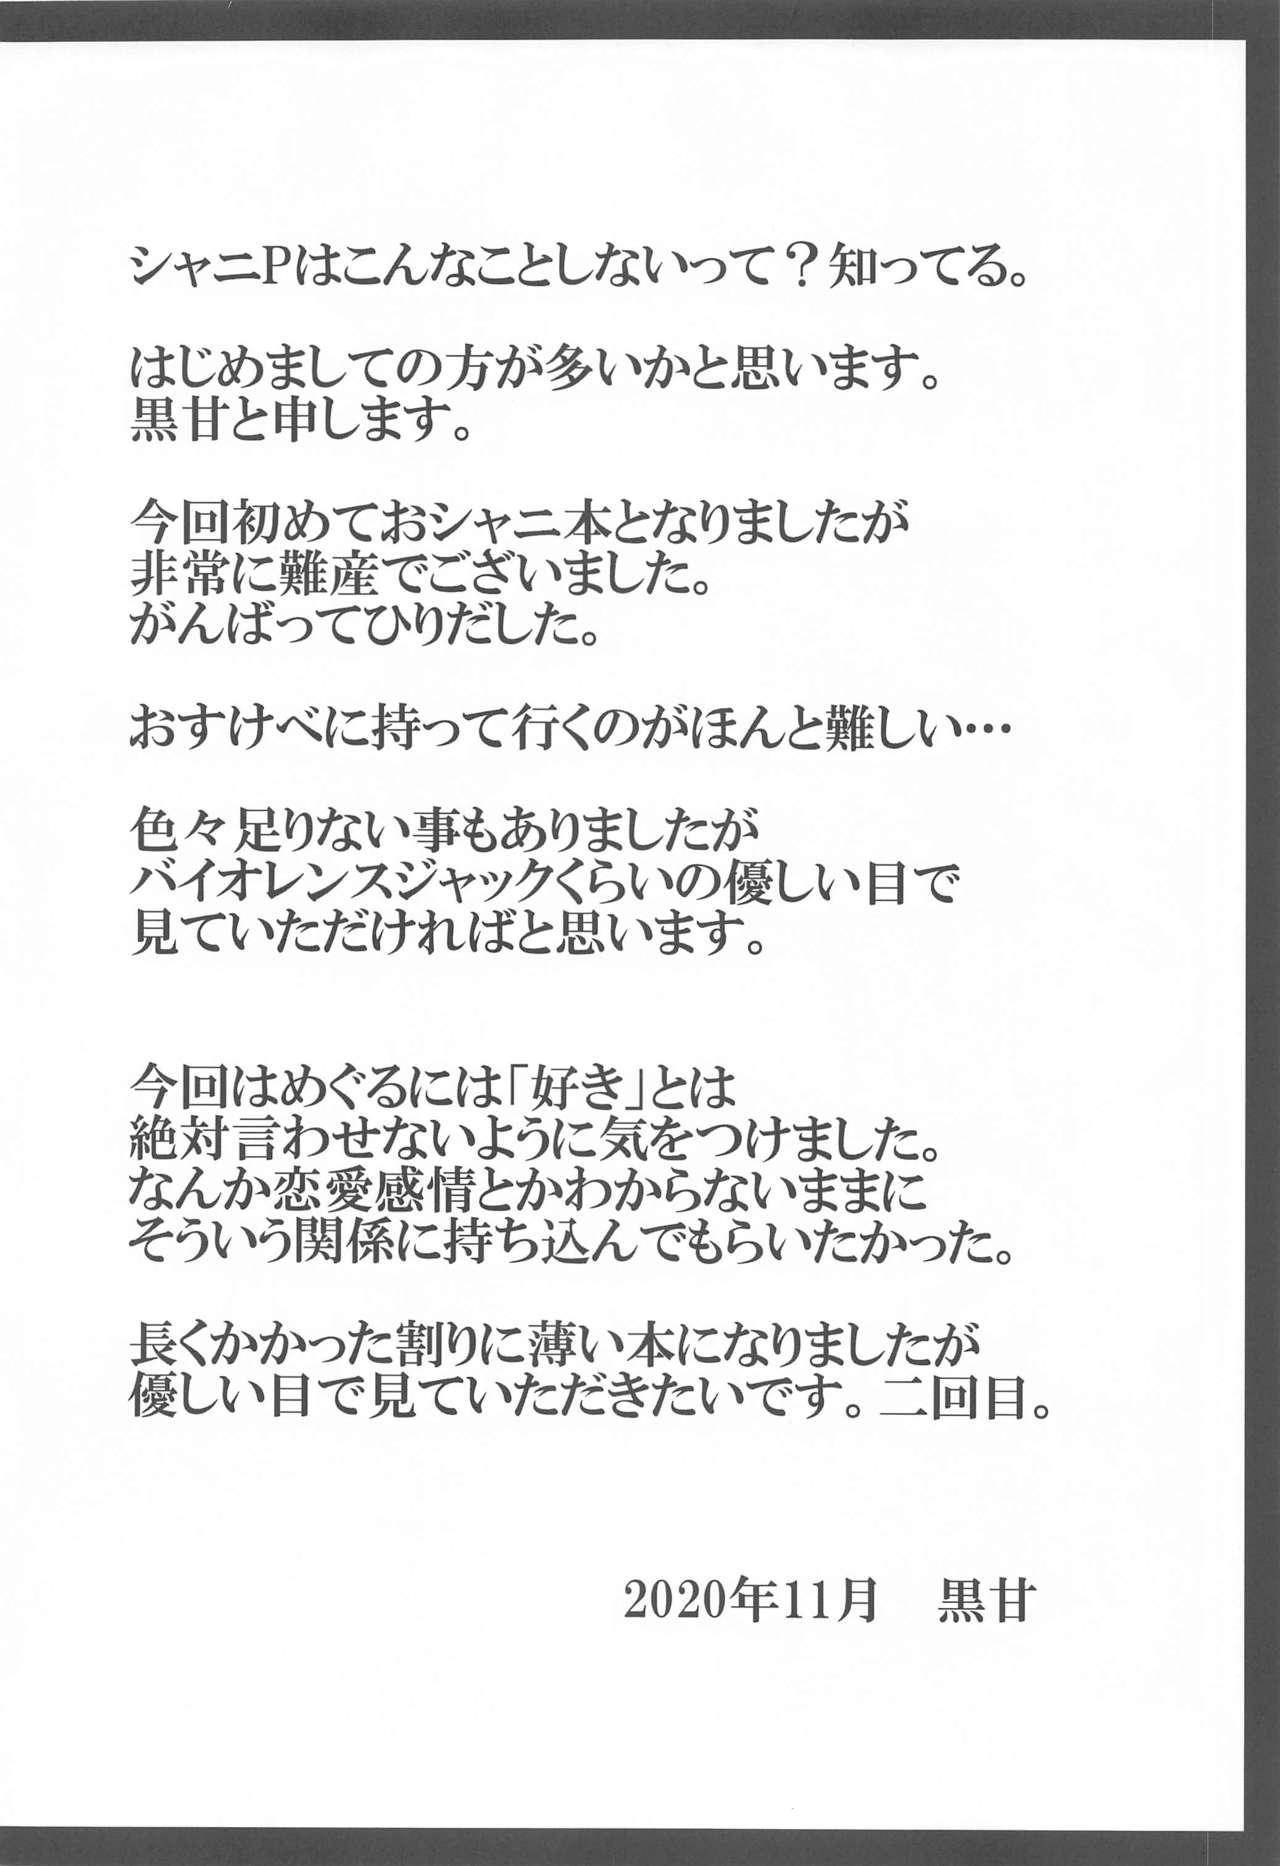 Oboreru Taiyou 2